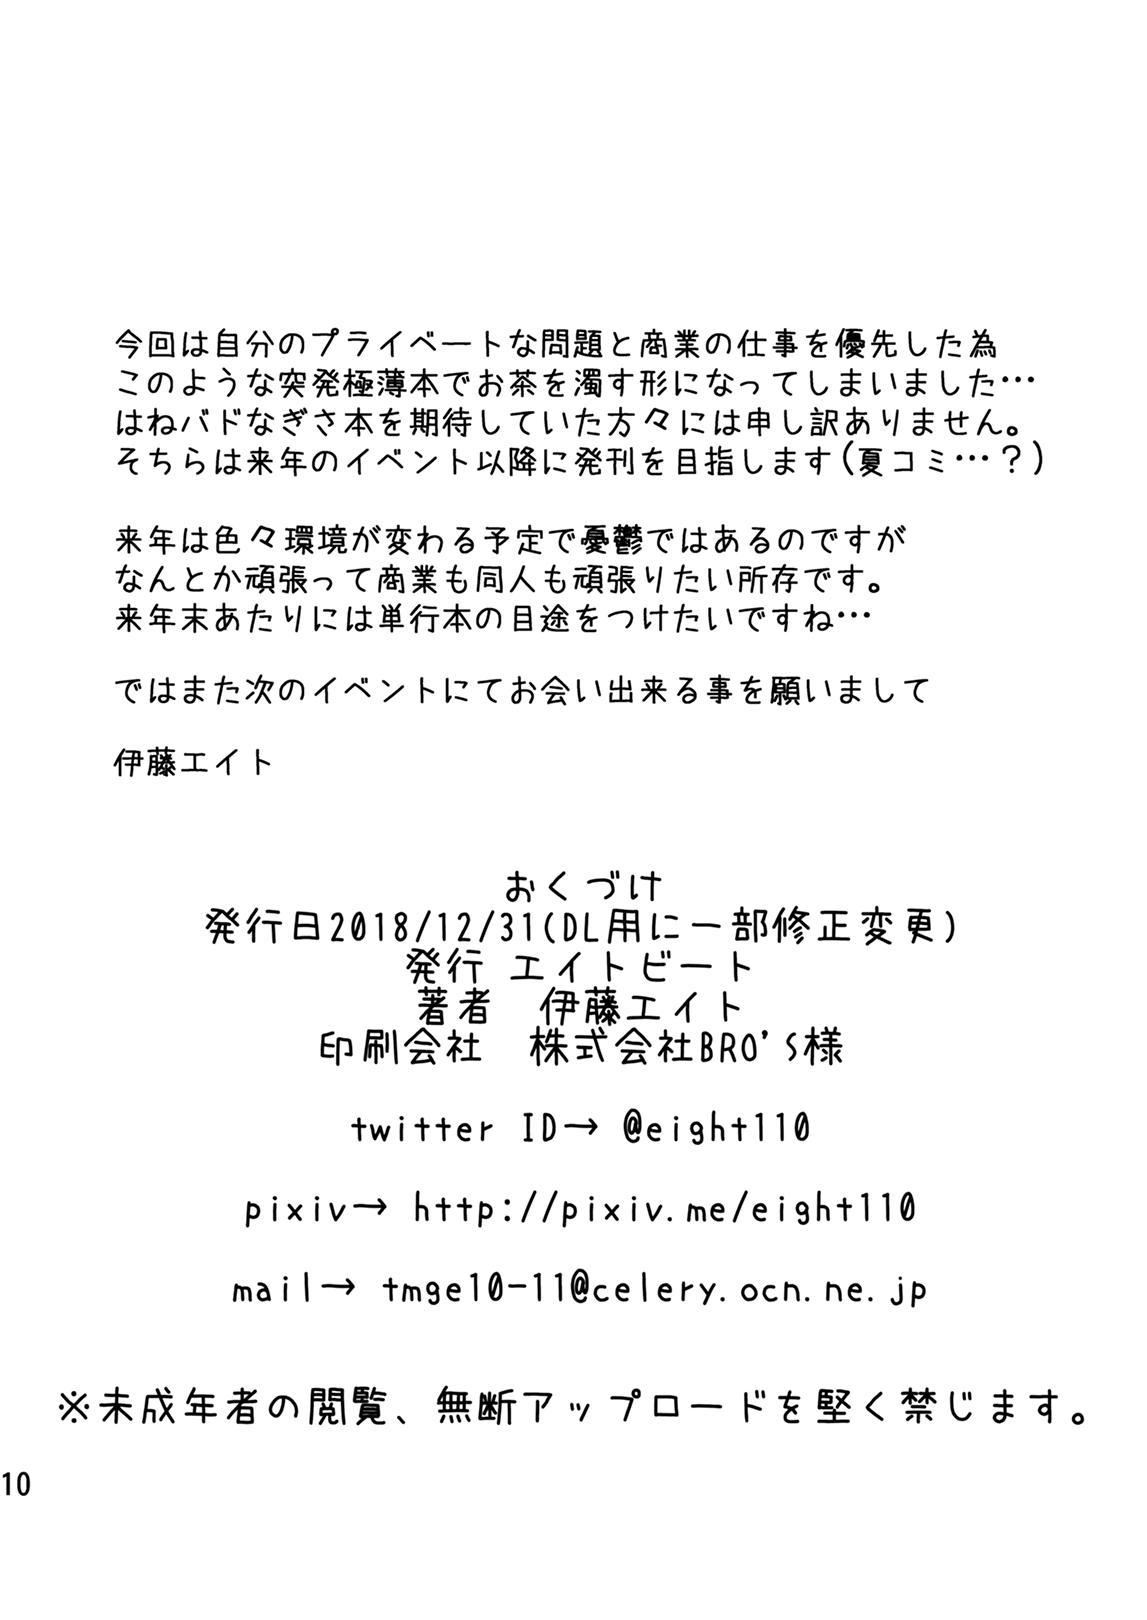 C95 Yorozu NTR Short Manga Shuu | C95 Collection of Various NTR Shorts 10